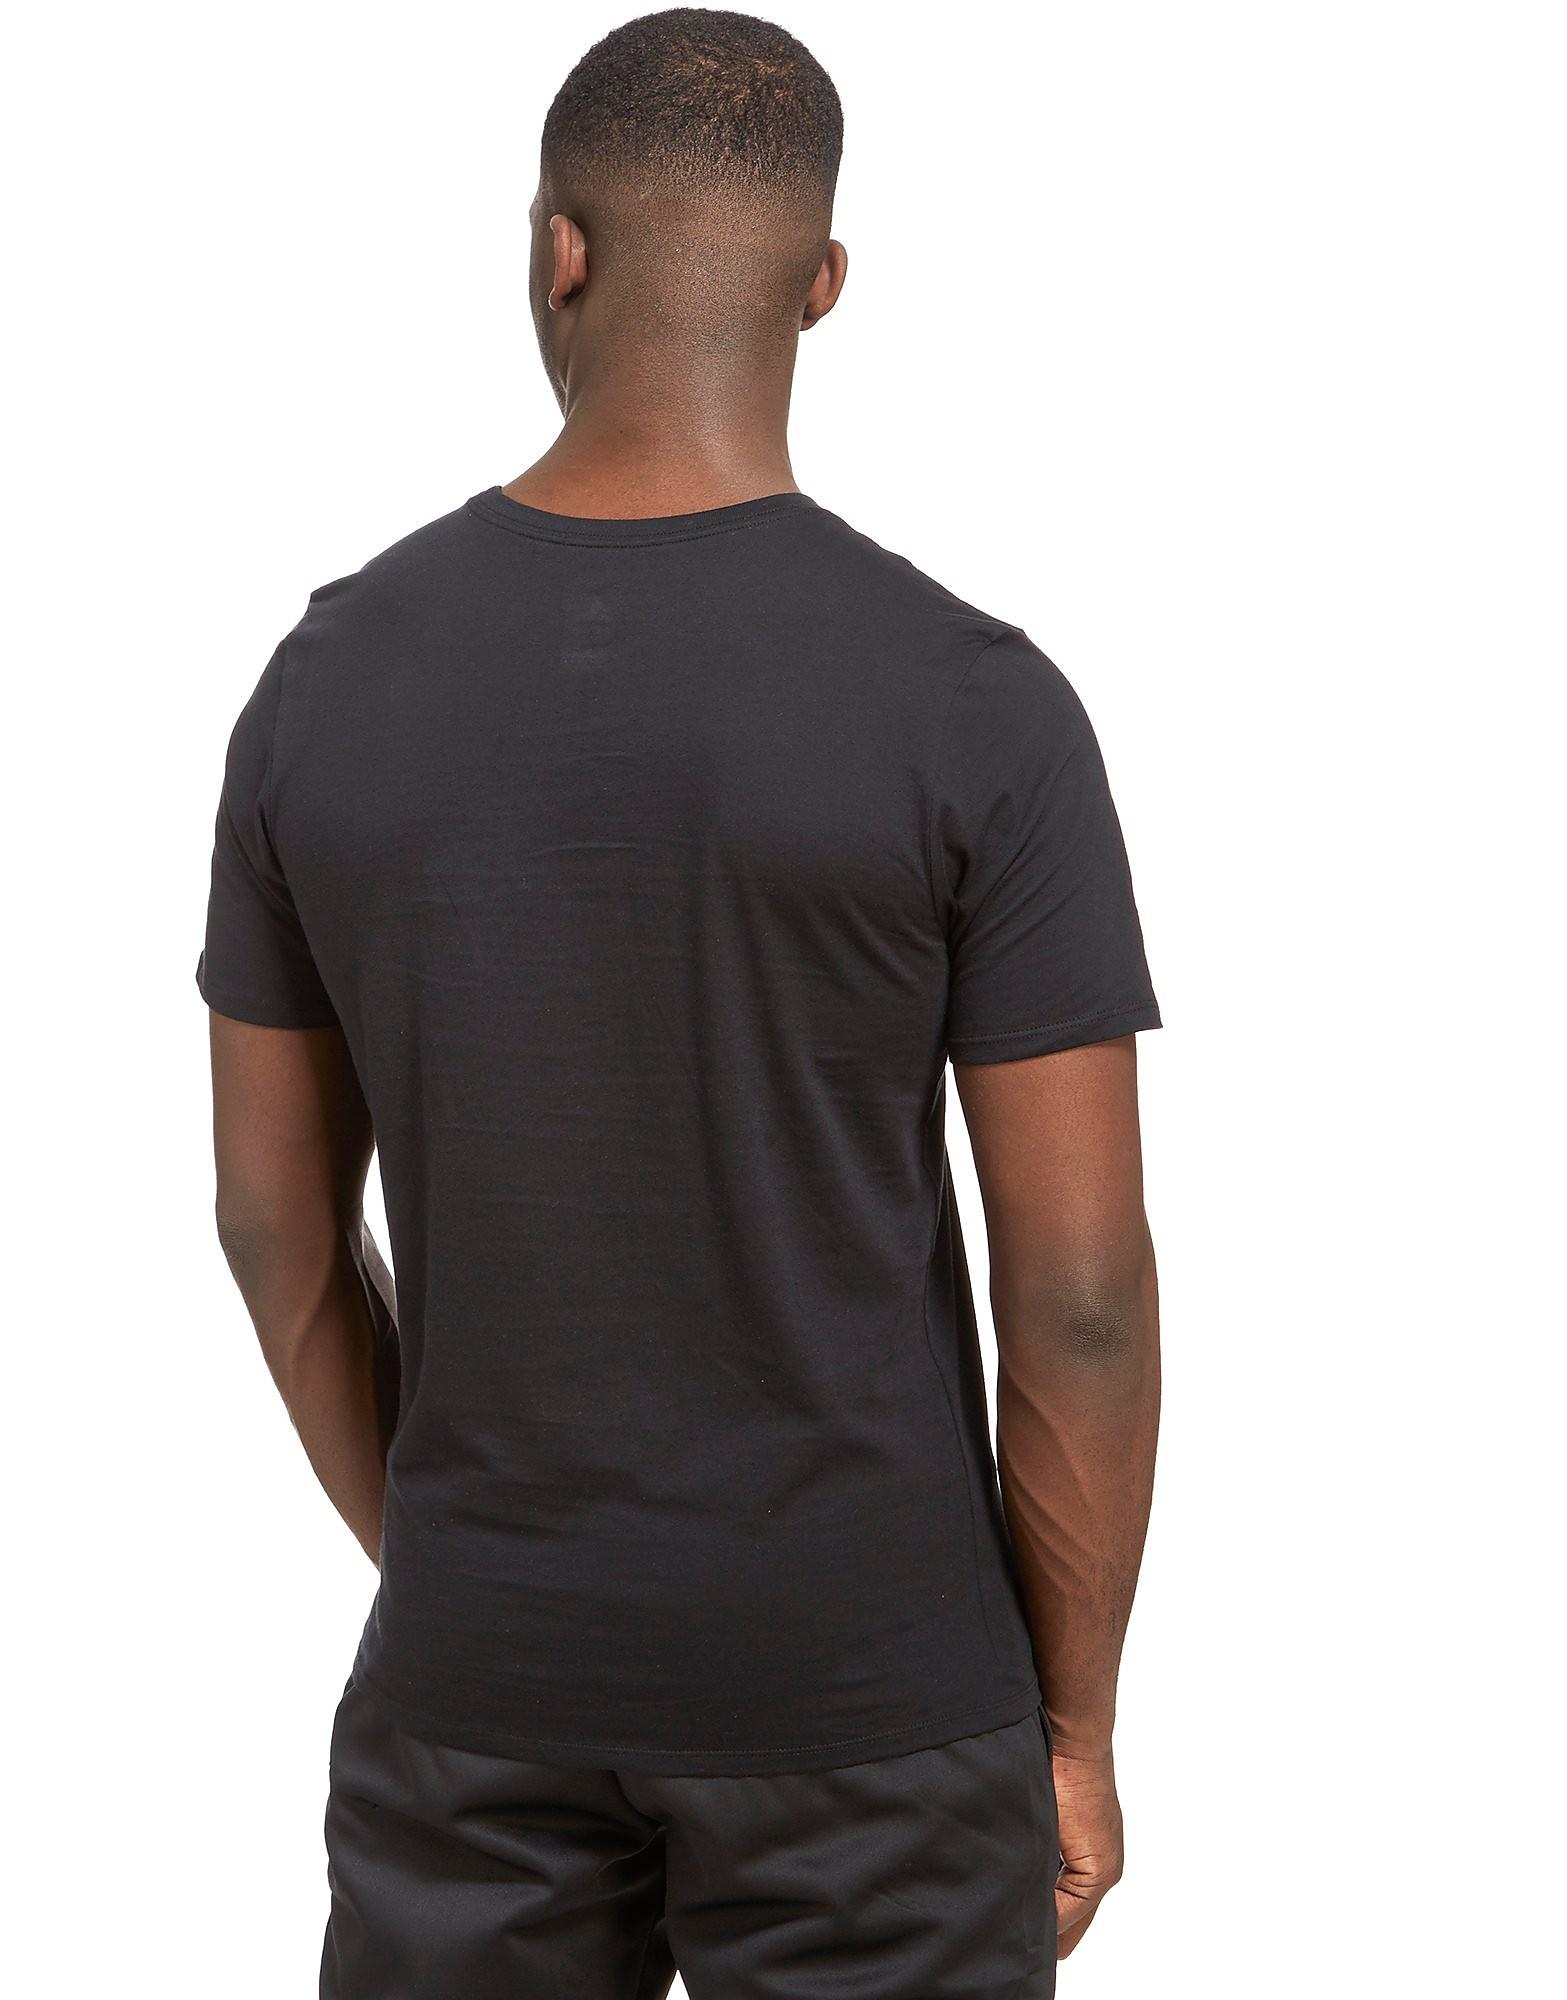 Jordan Stretched T-Shirt